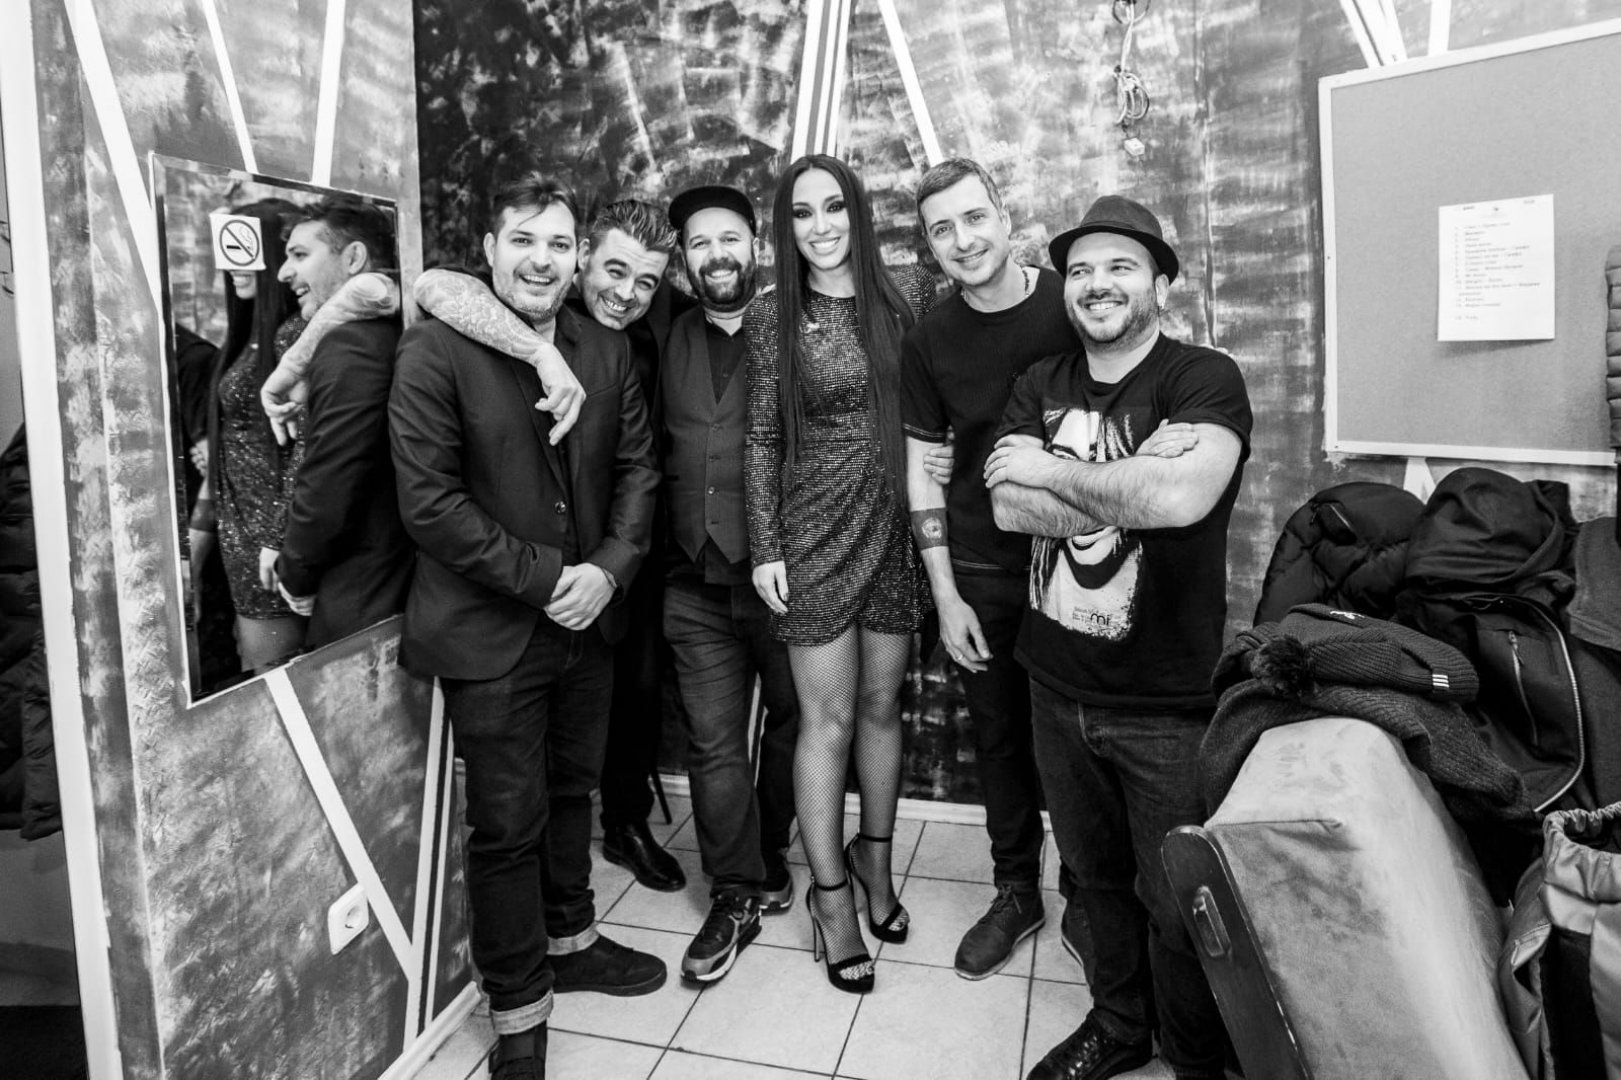 Мария Илиева ще изнесе концерти и в двата морски града - Бургас и Варна